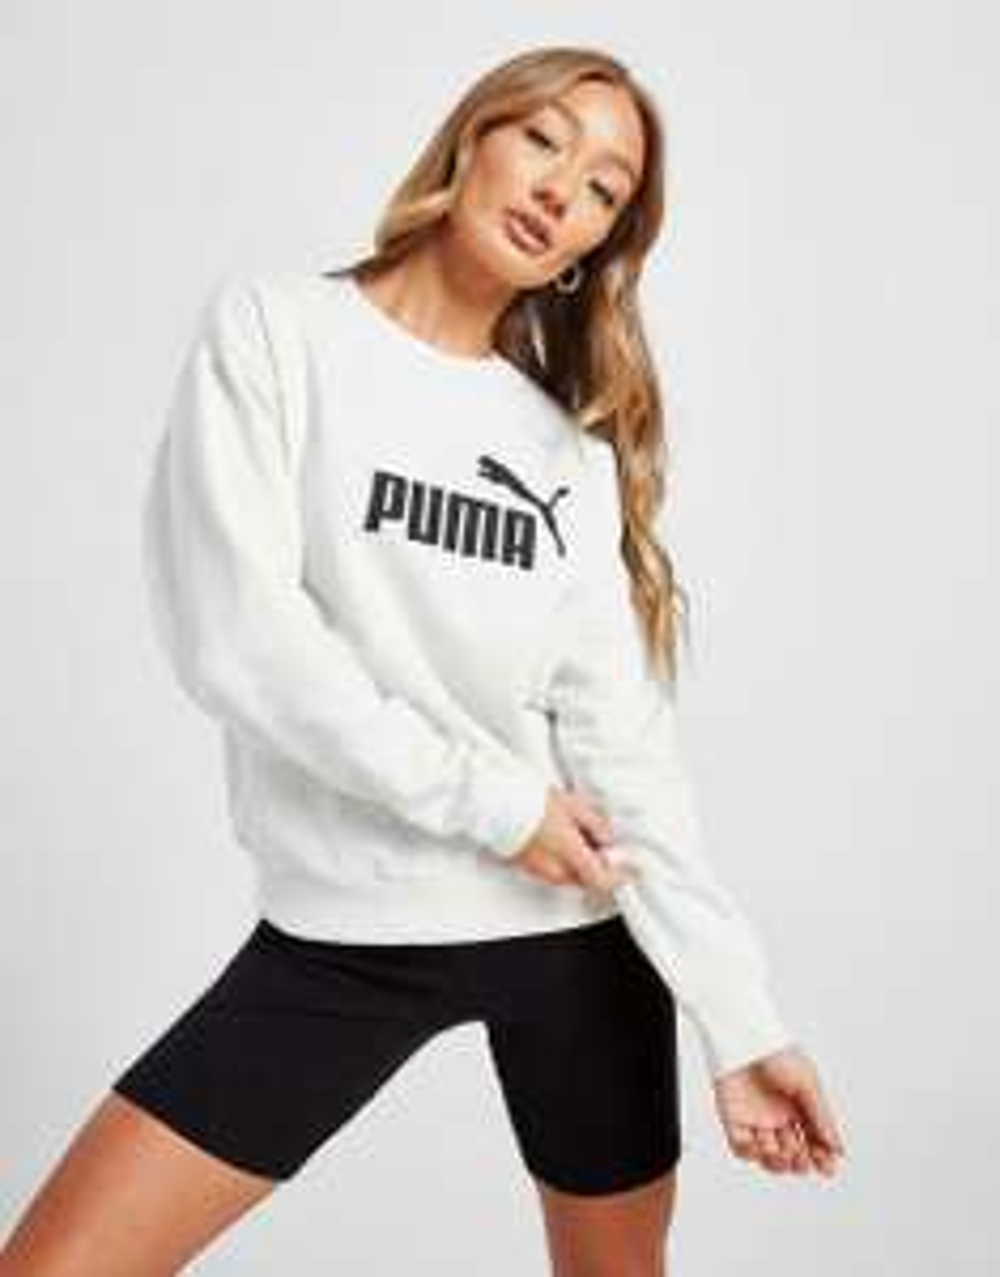 Puma Women's Core Crew Long Sleeve Sweatshirt White / Black £10.19 delivered @ JD Outlet /eBay